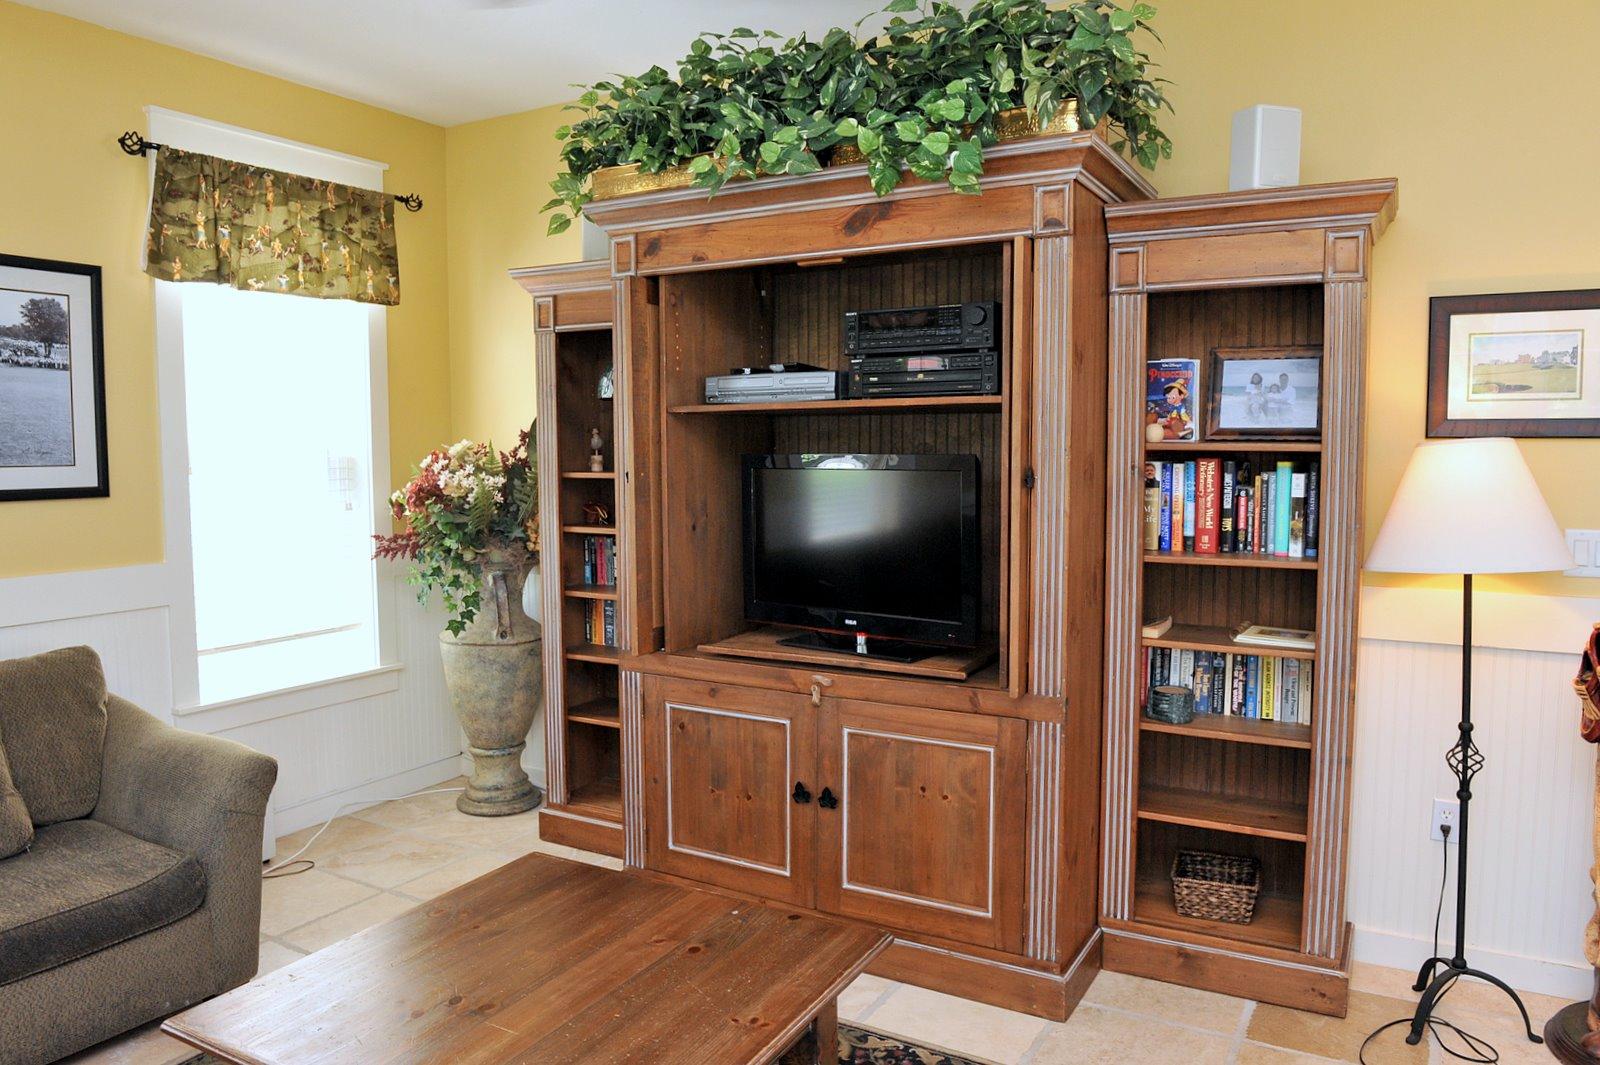 1280 Laurel Grove Condo rental in Sandestin Rentals ~ Cottages and Villas  in Destin Florida - #3